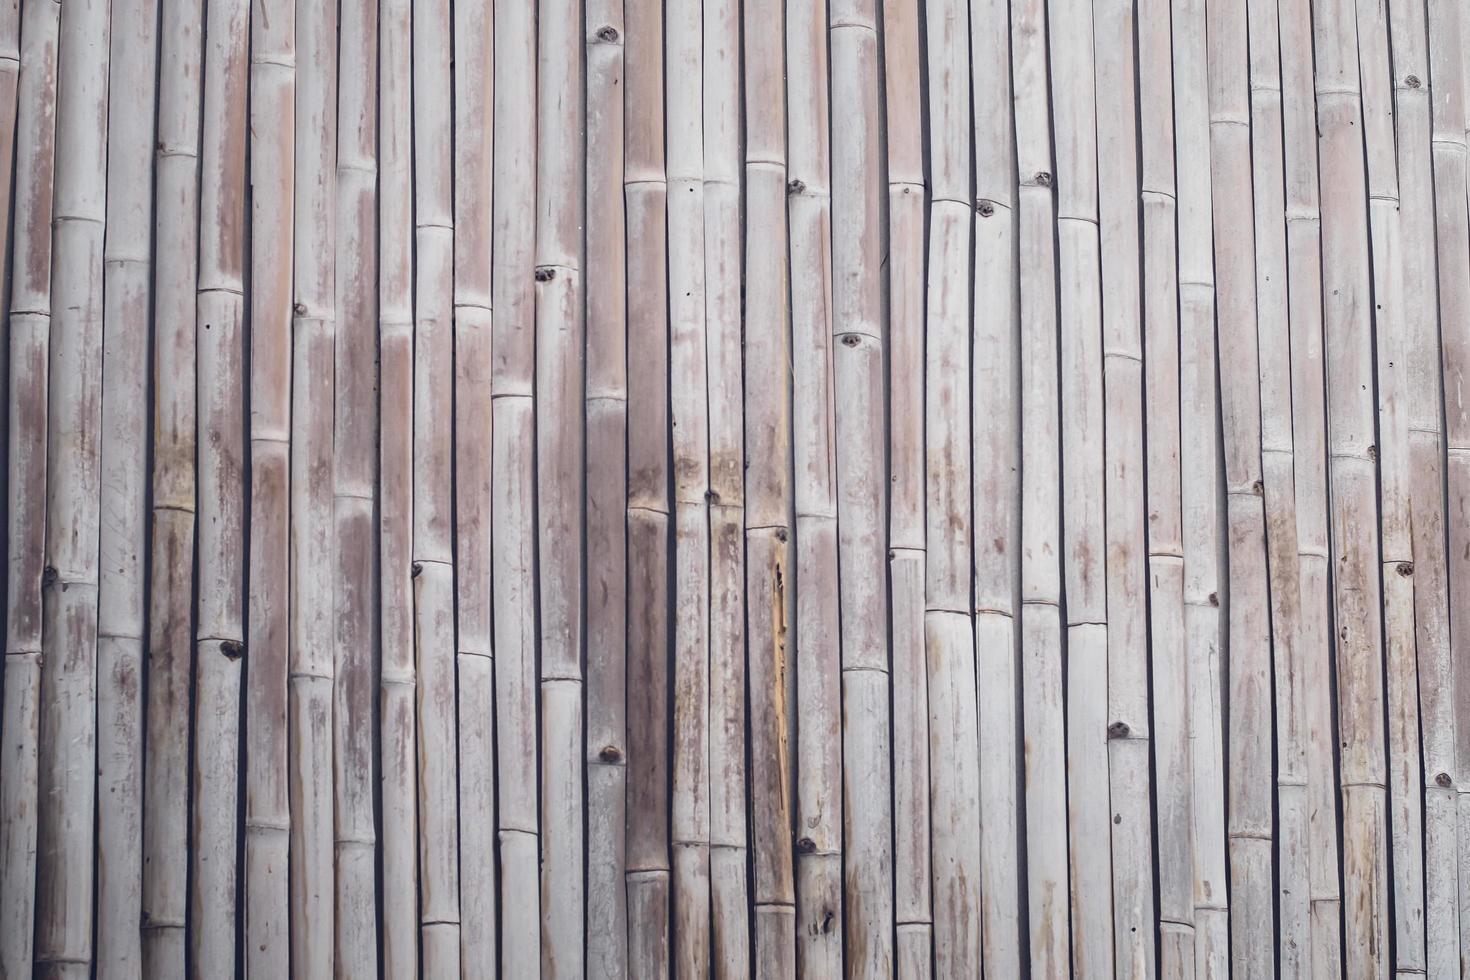 Close-up of wooden bamboo wall photo